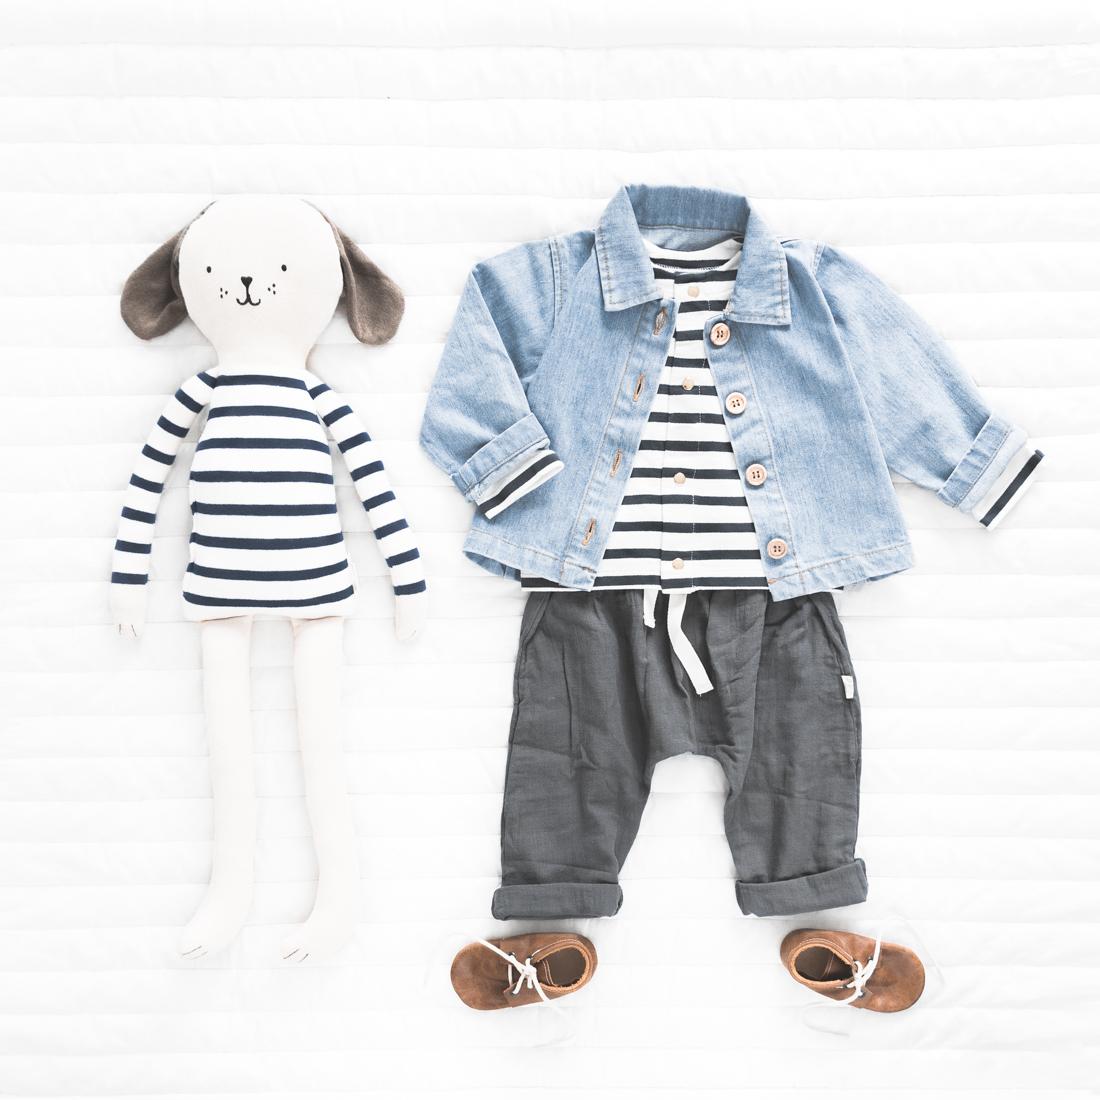 1100_minilooks_blog_mode_bebe_baby_fashionblog_copyright_PaulinePRIVEZ_paulinefashionblog_com-2-2